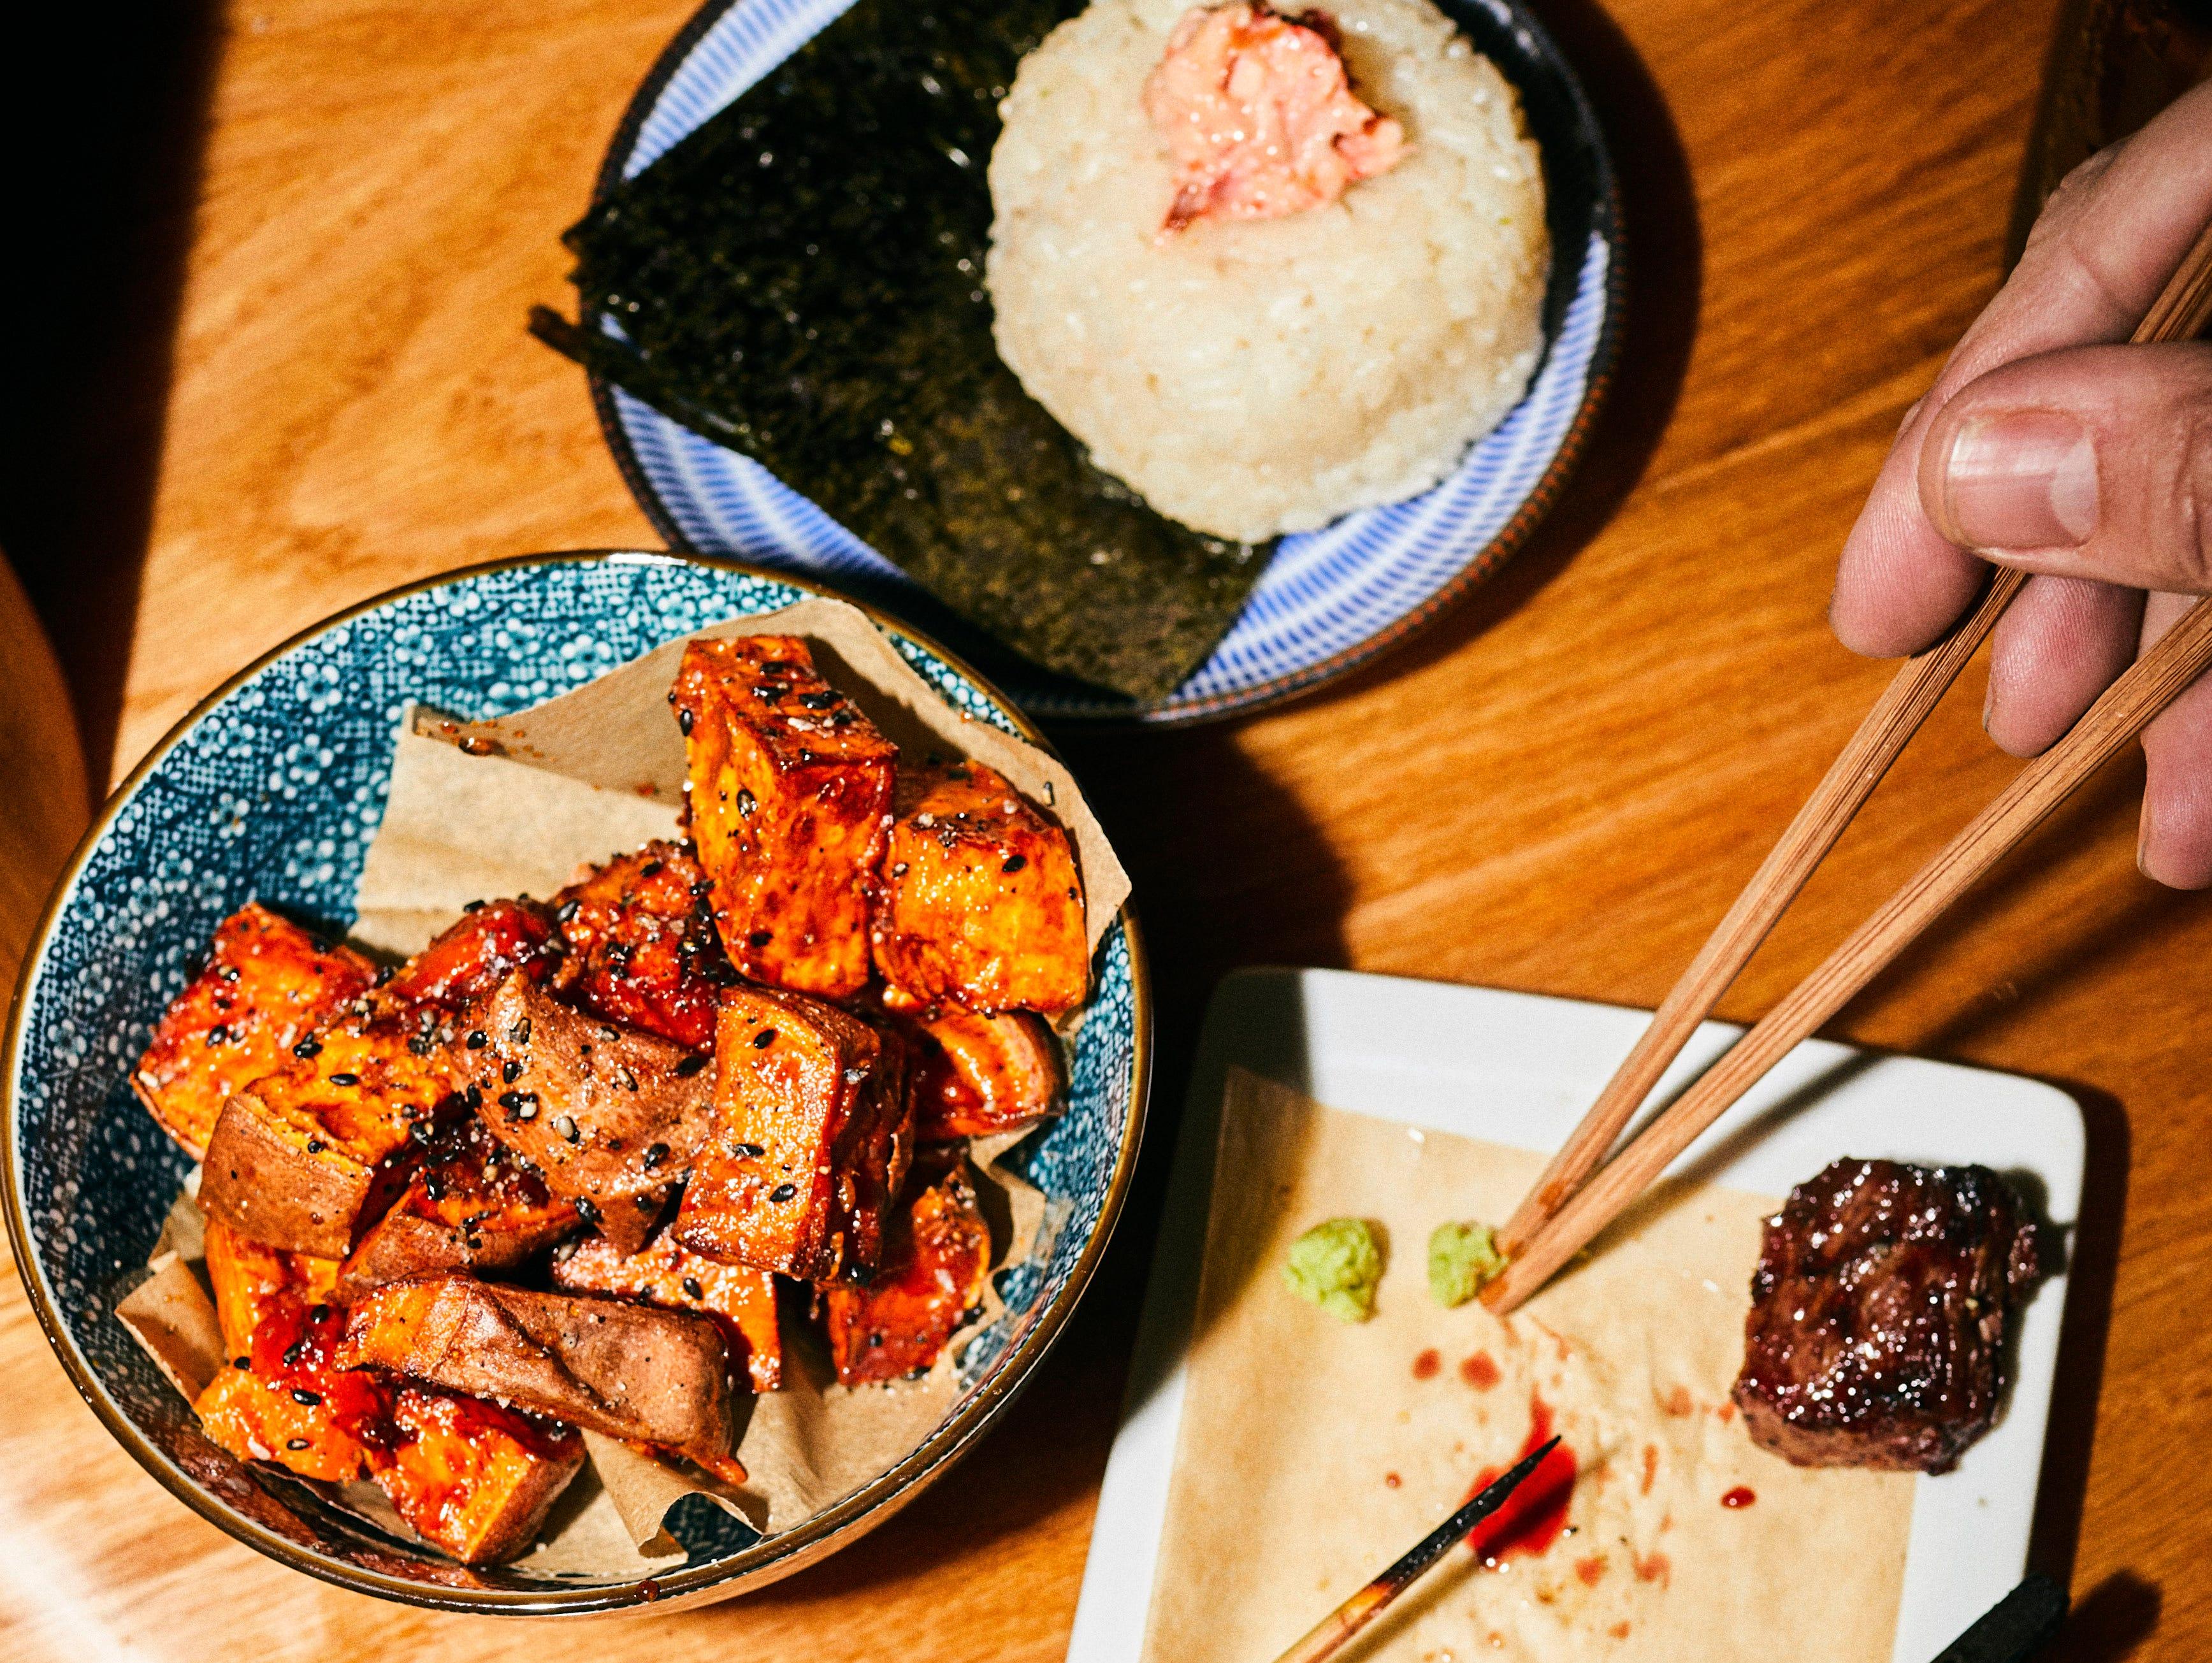 Crispy sweet potatoes in honey-tamari sauce, salmon onigri, skewered steak and chicken at Bar Otaku.